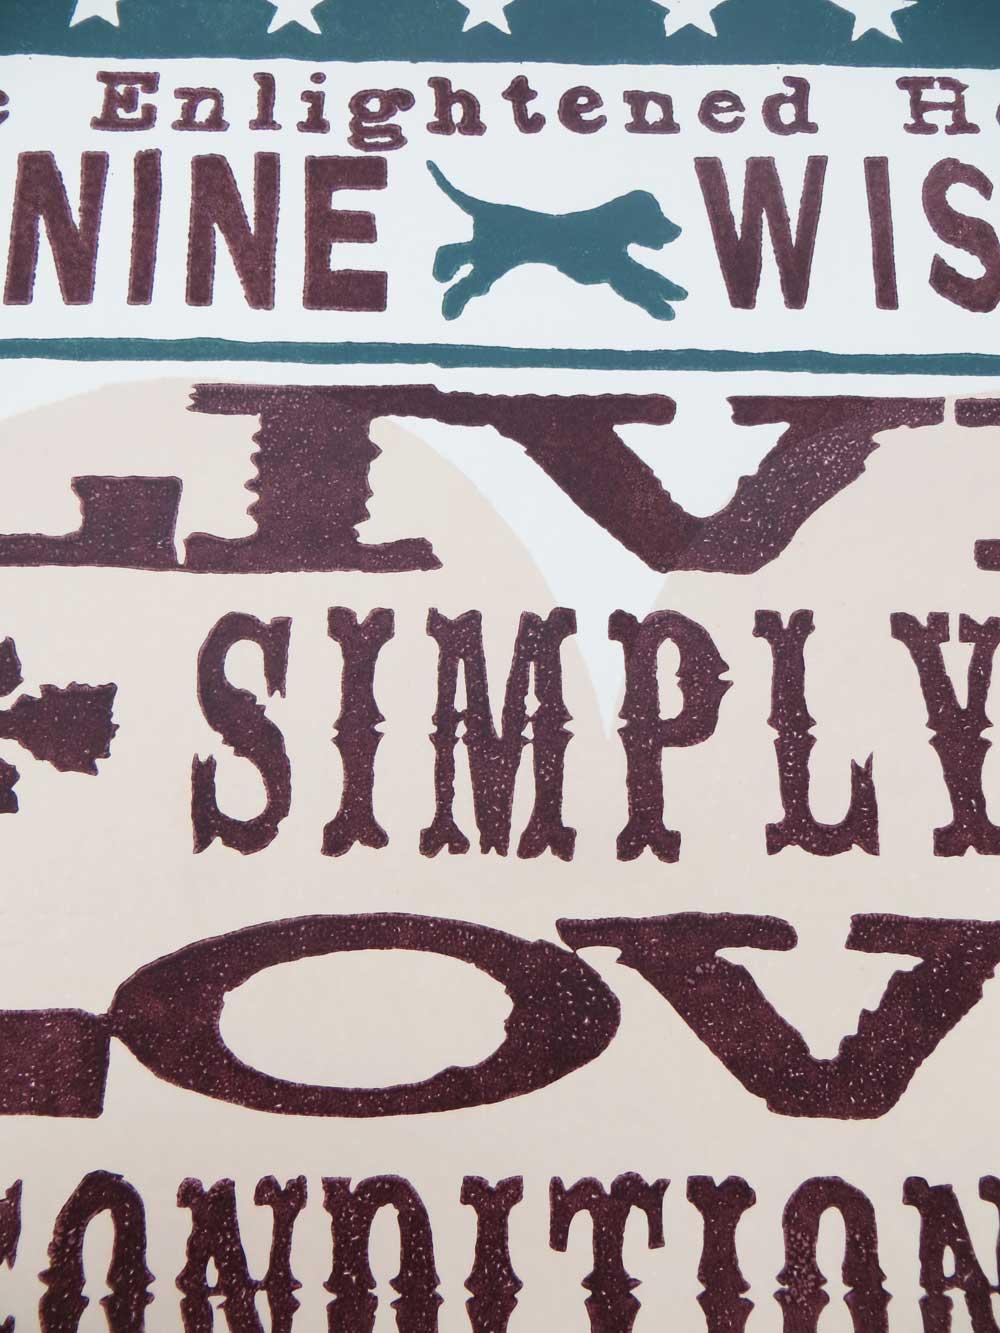 Dog sayings typographic word art print: The Enlightened hound